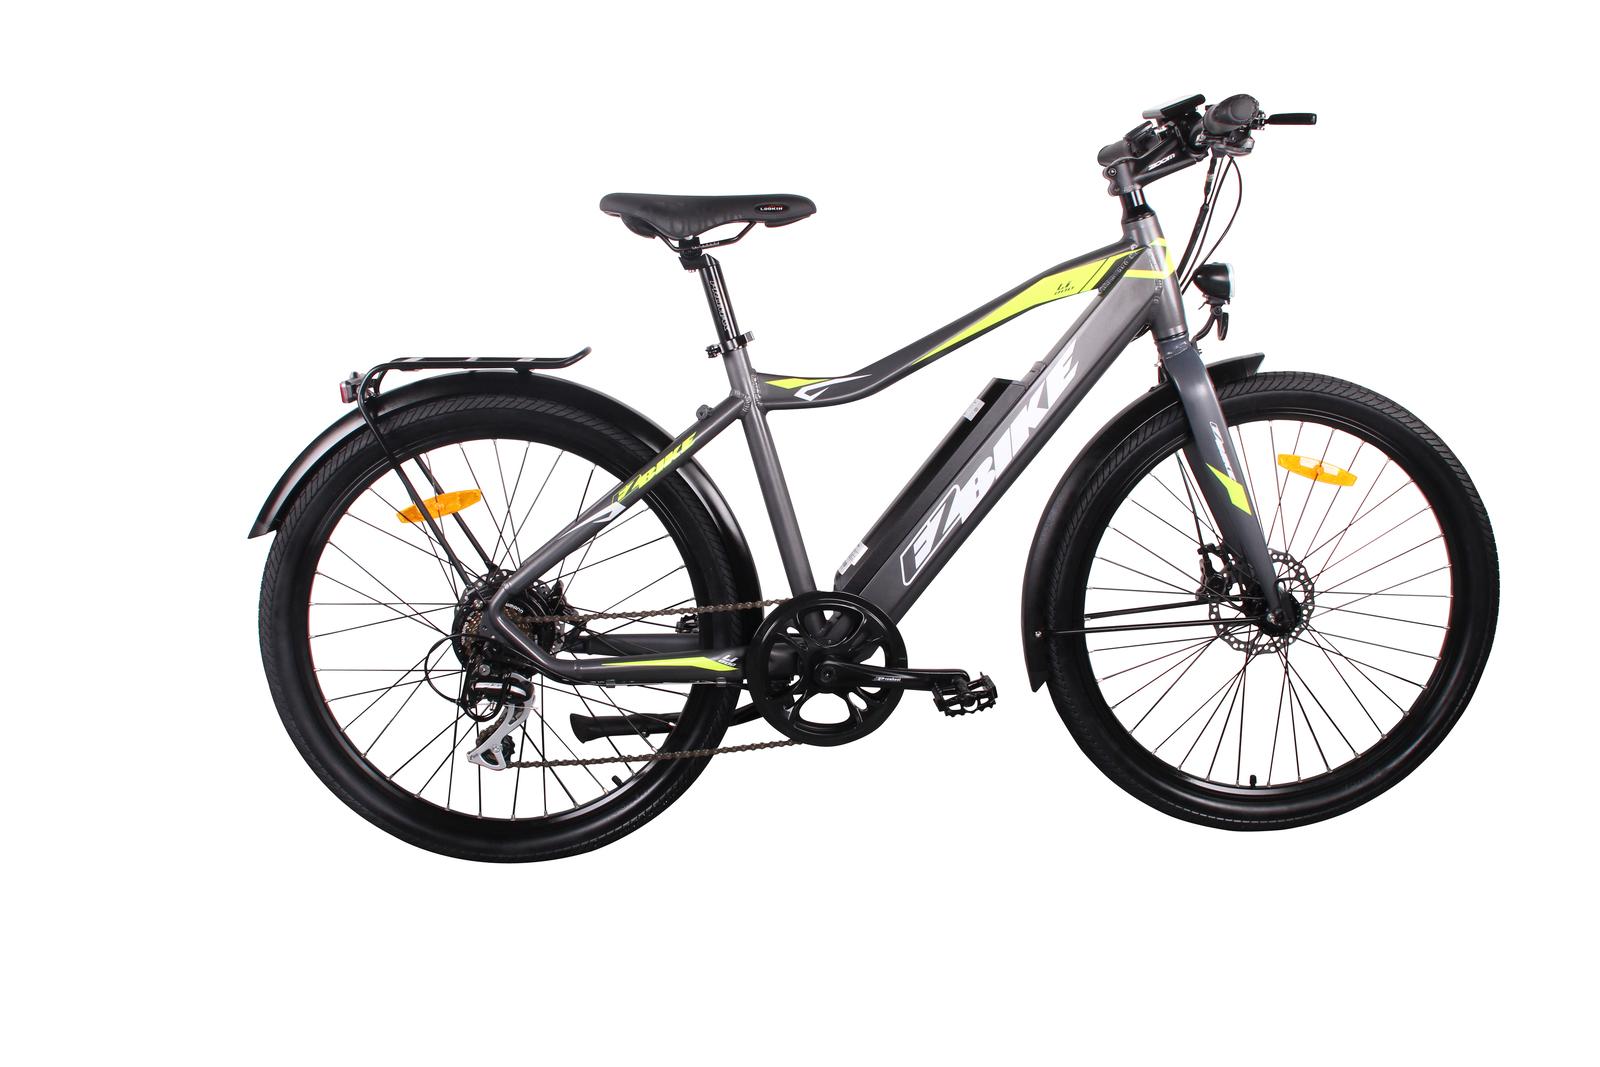 Universal Electric Bicycle 250w 36v 10 4ah Li Ion Battery